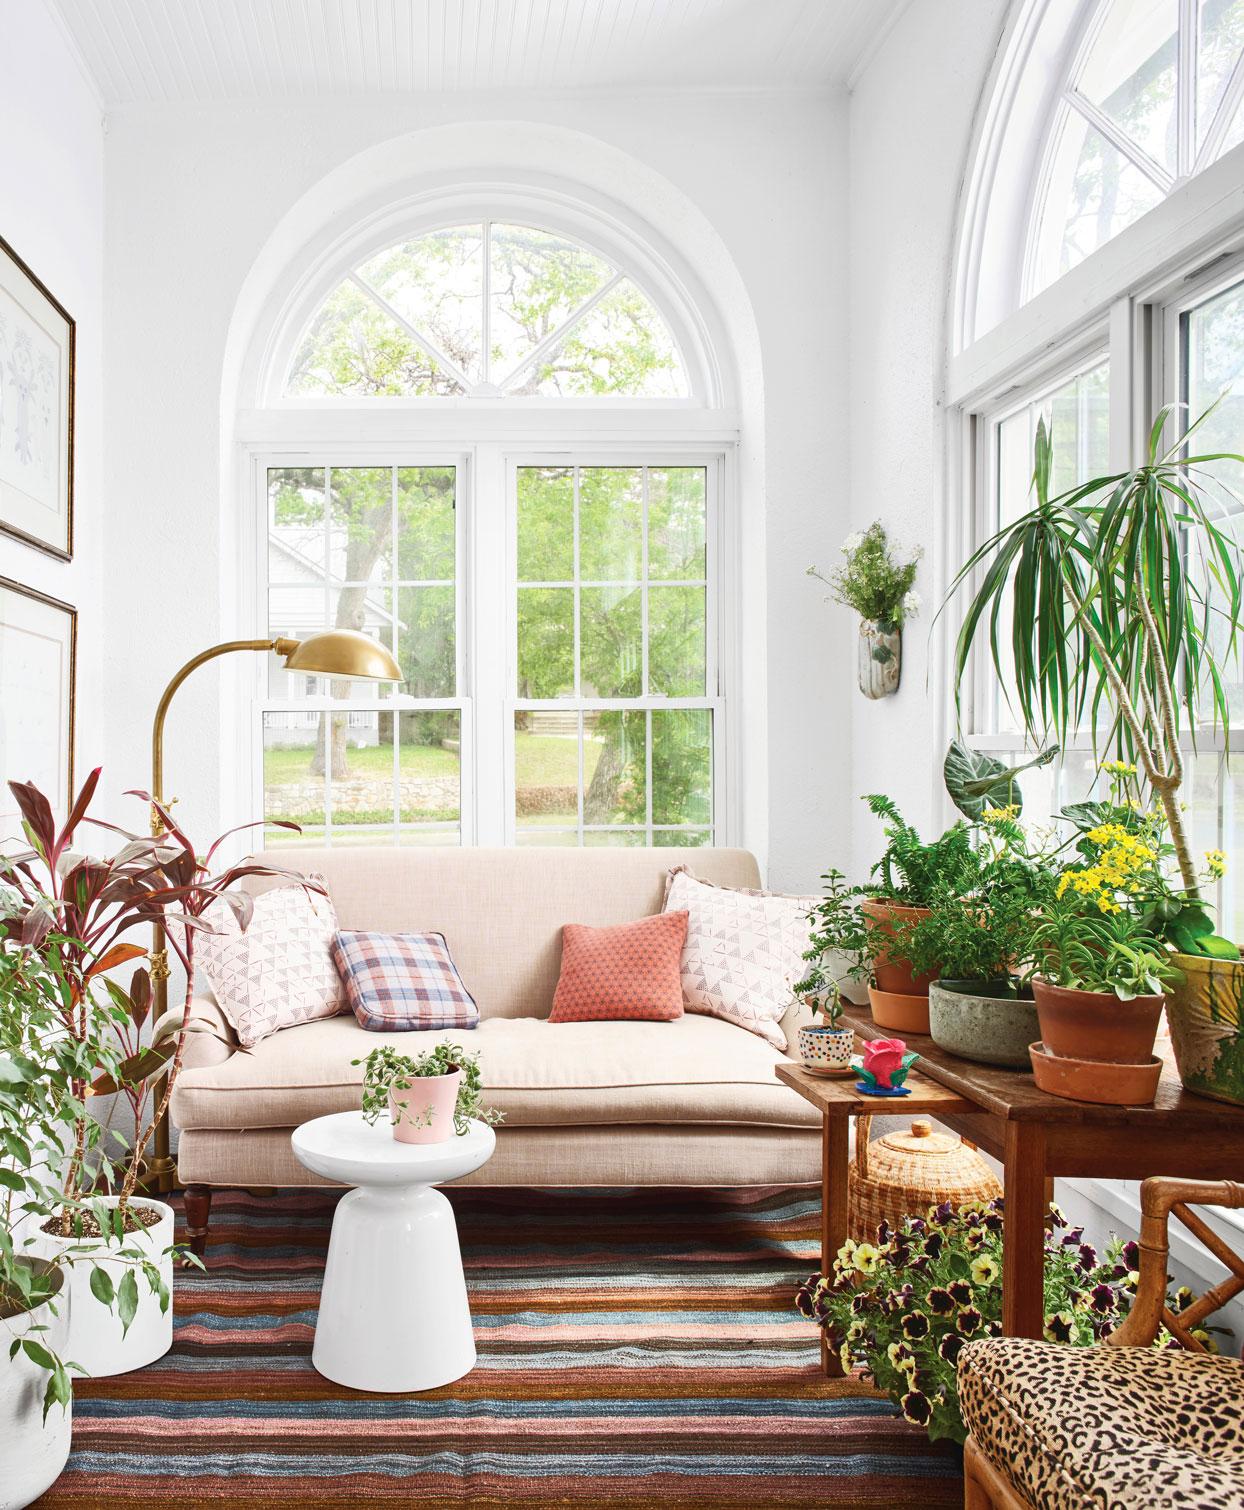 pink sofa in sunroom